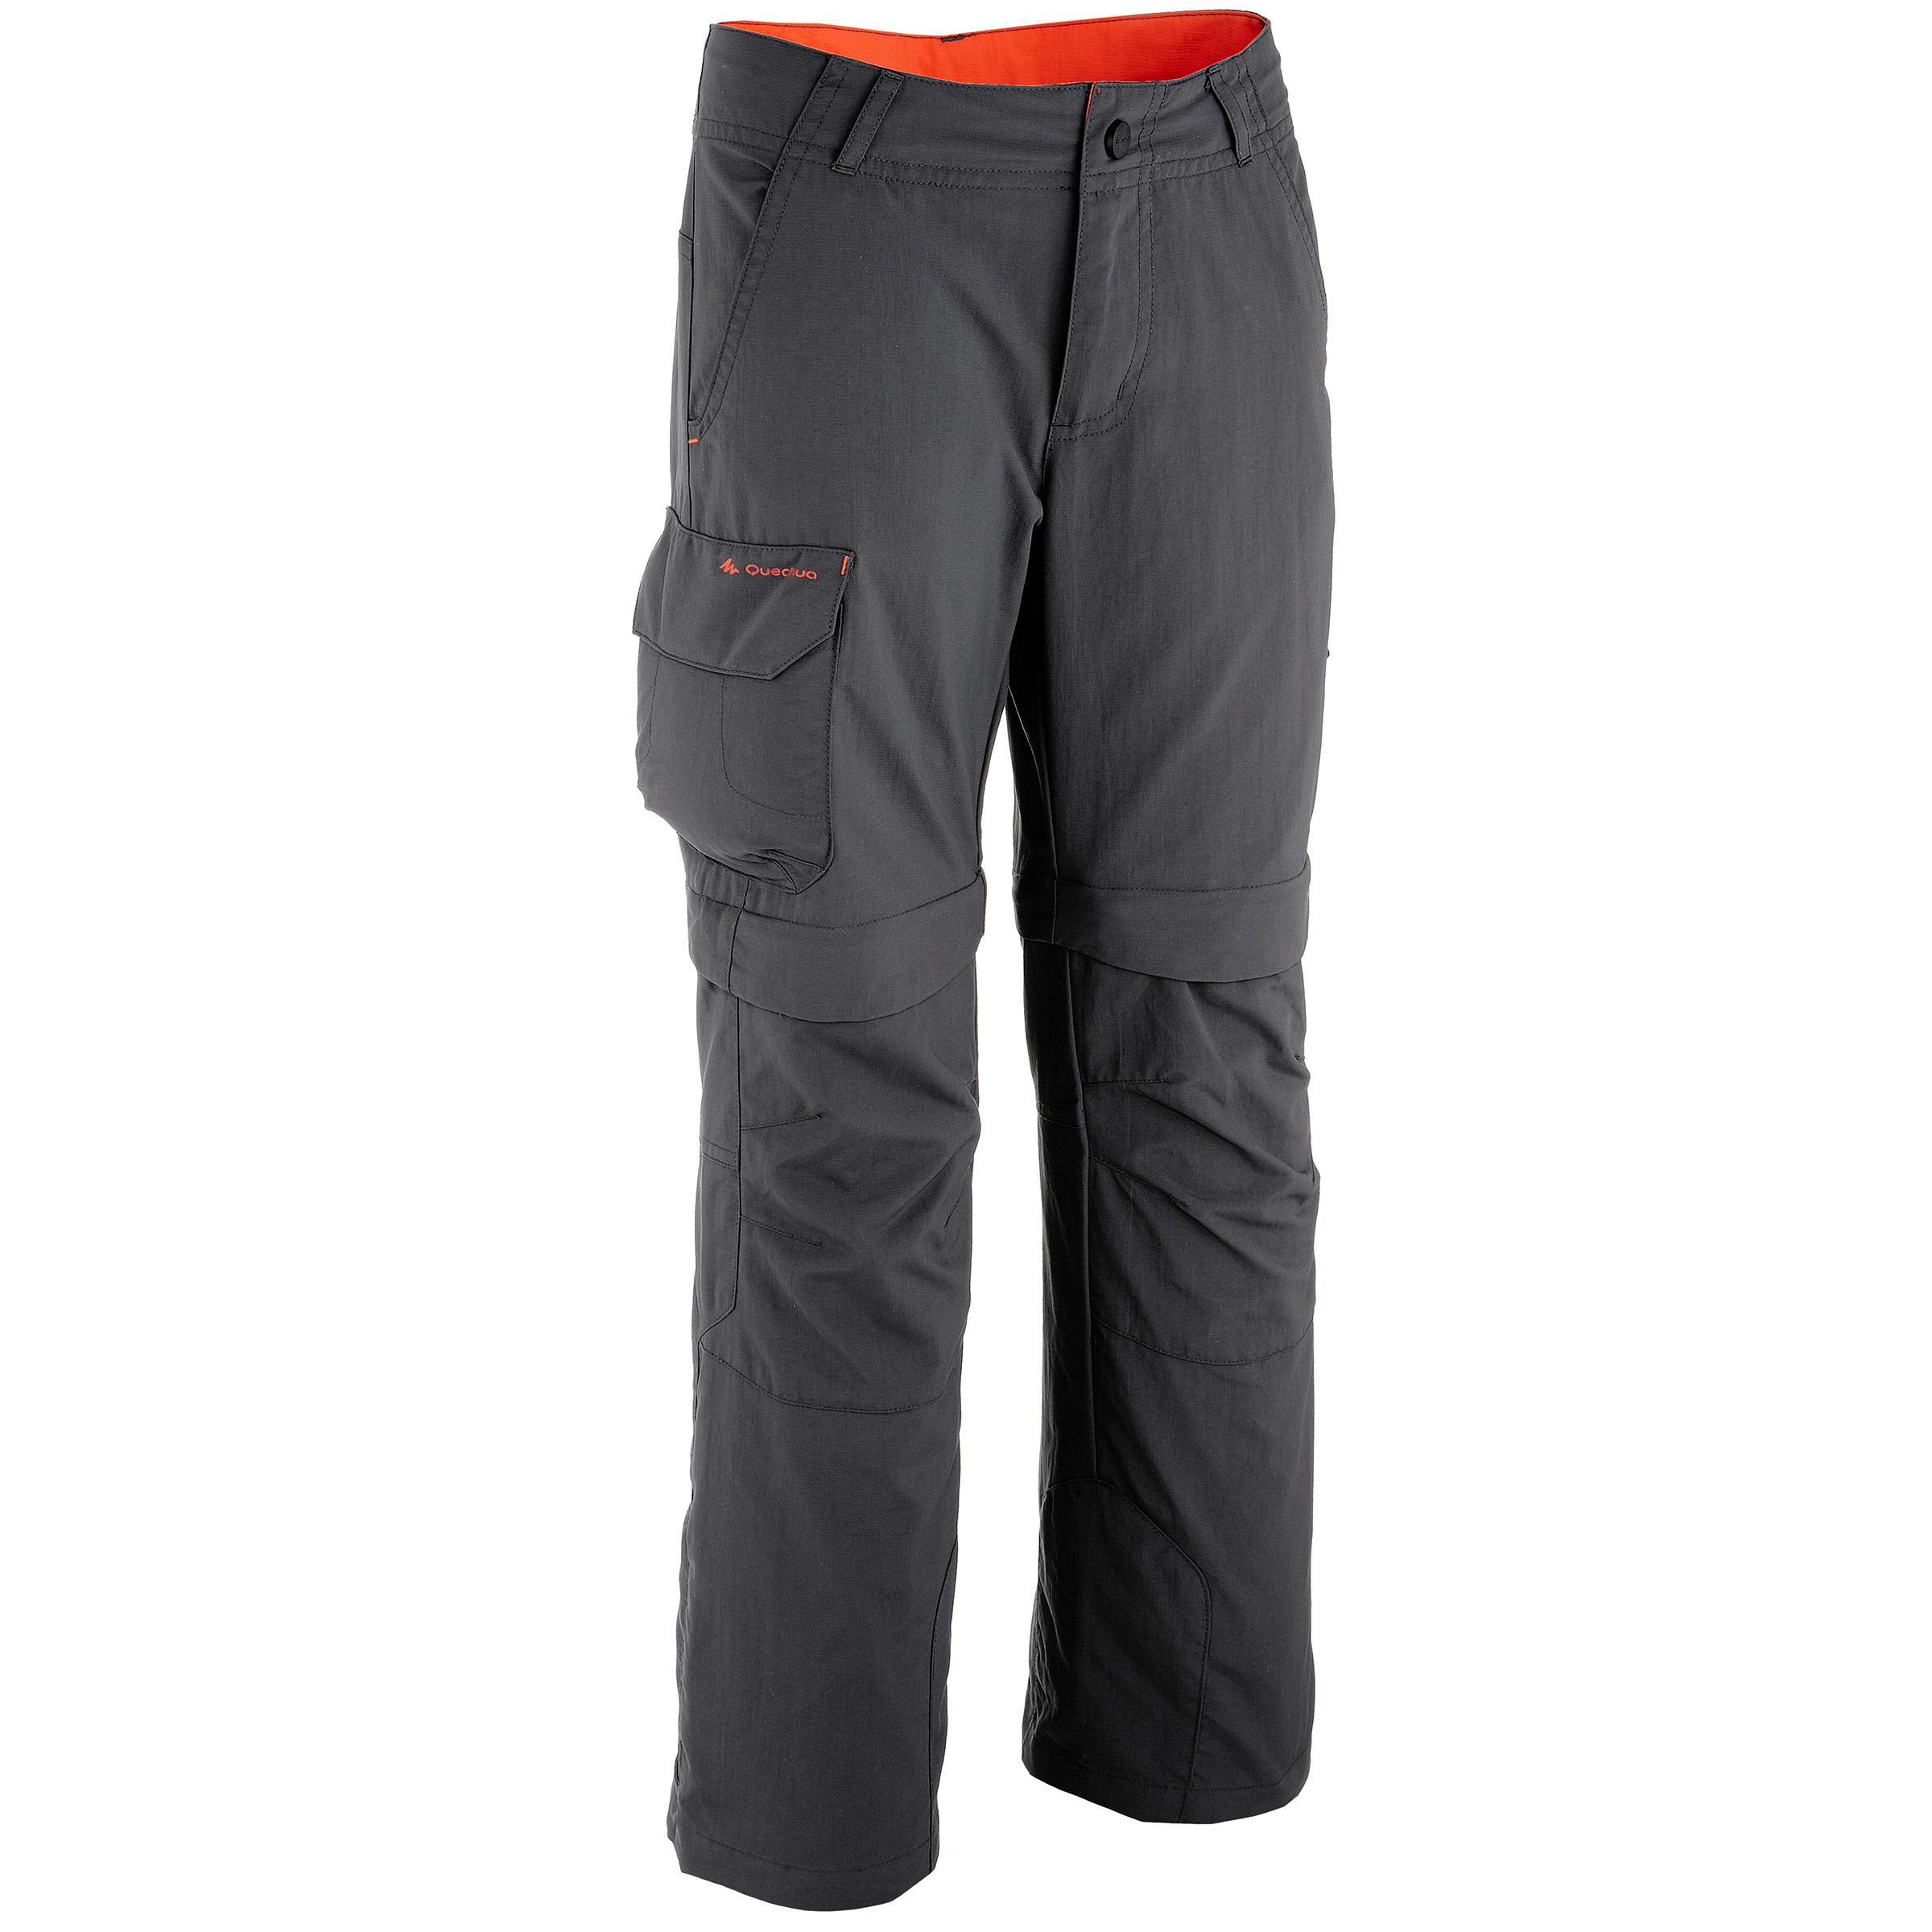 Hike 900 Modular Children's Hiking Trousers - Black